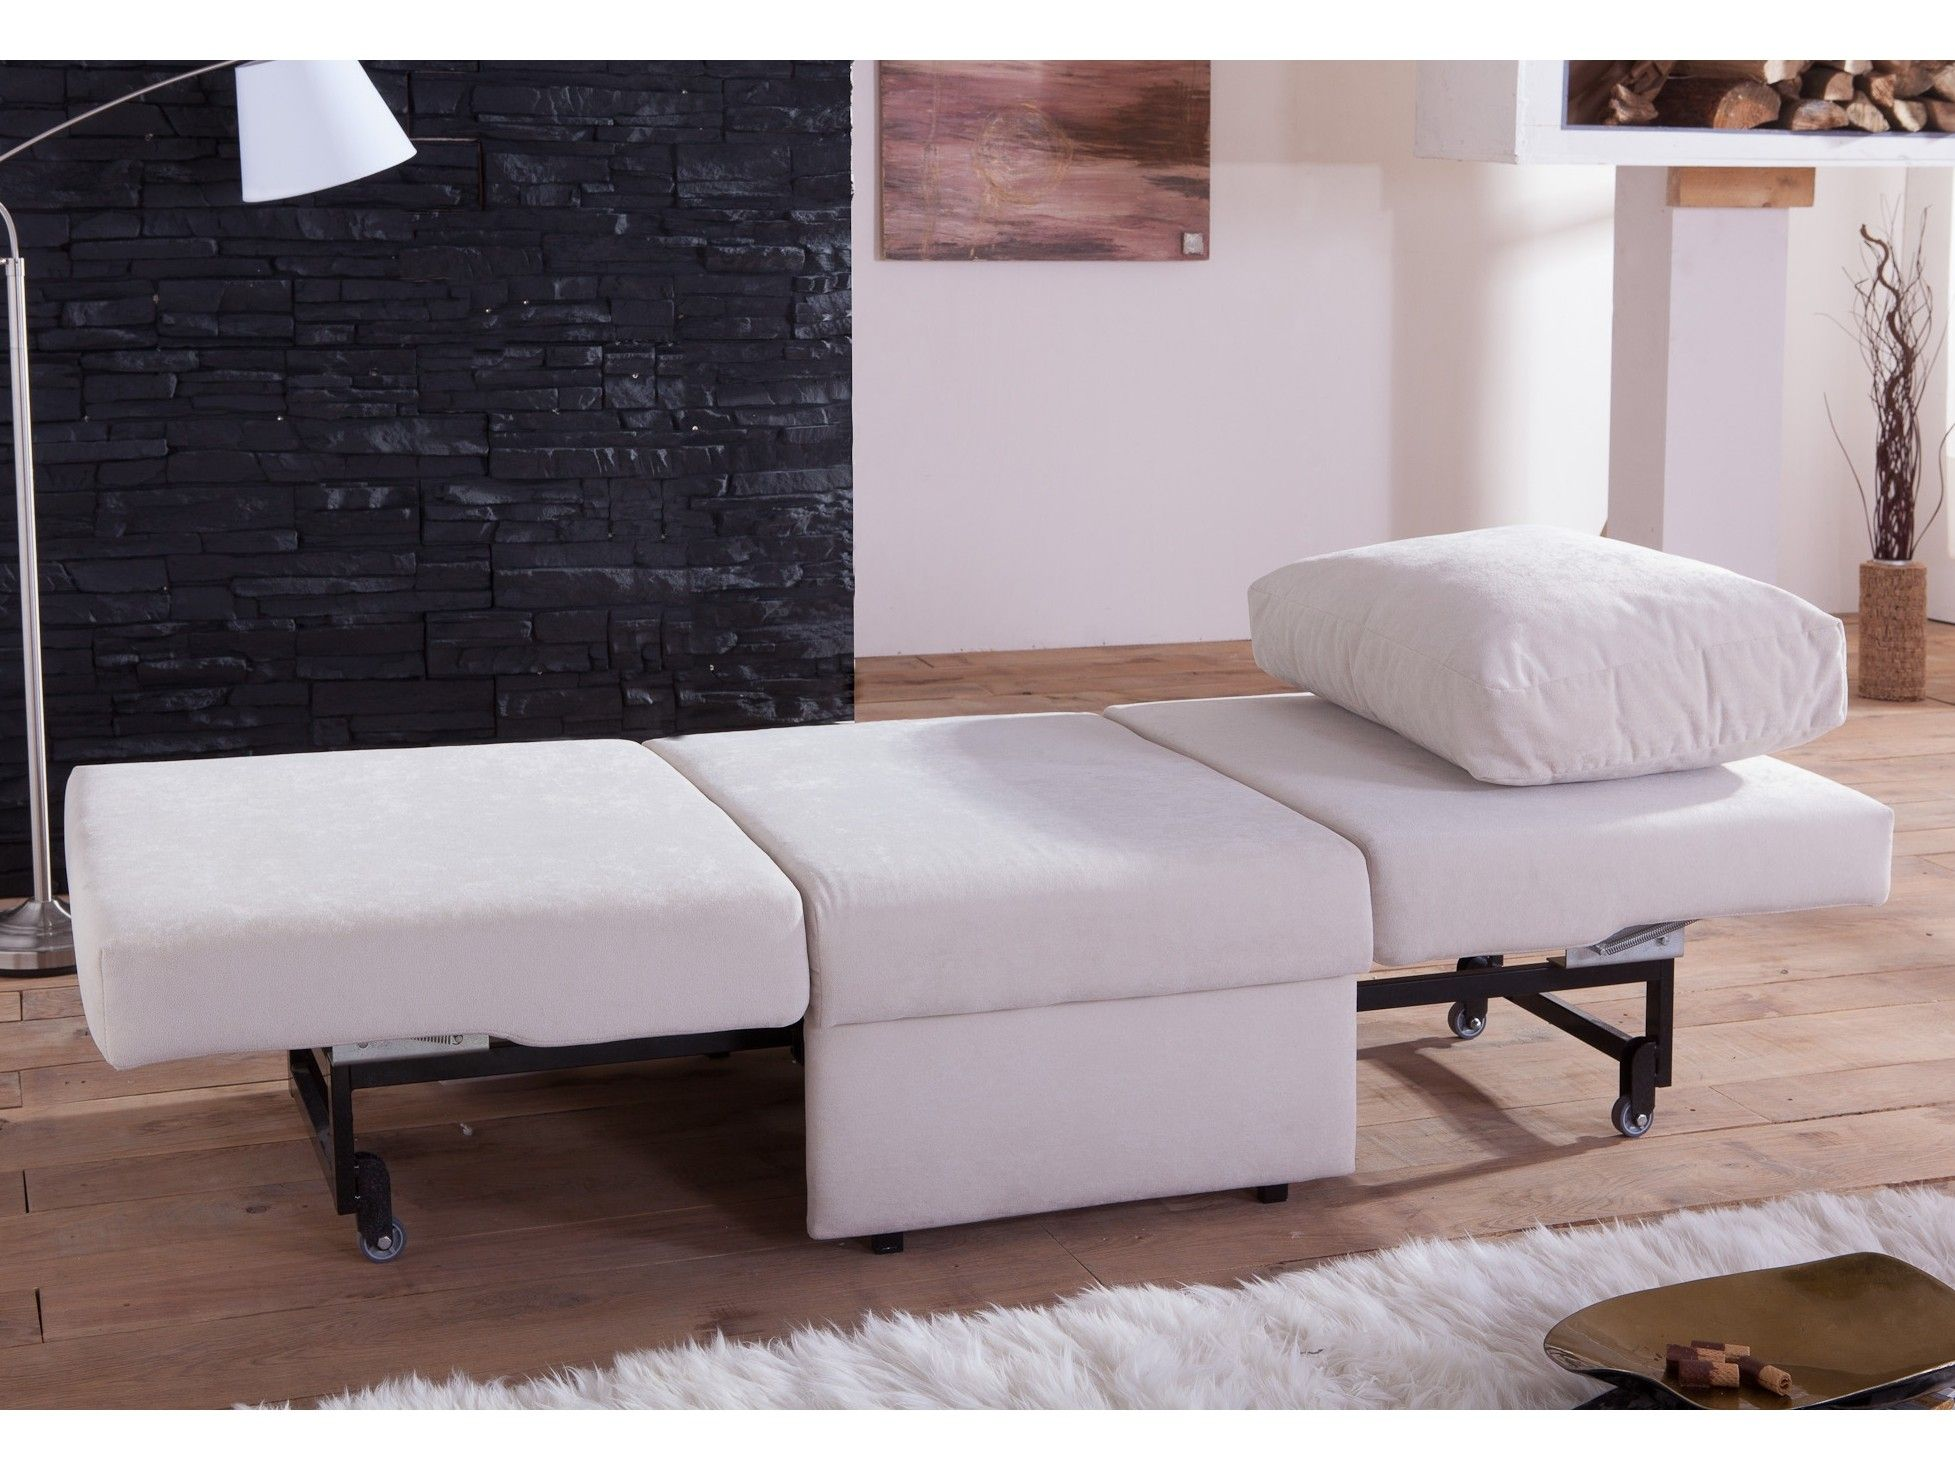 Schlafzimmer Sessel ~ Schlaf sessel badezimmer schlafzimmer sessel & möbel design ideen